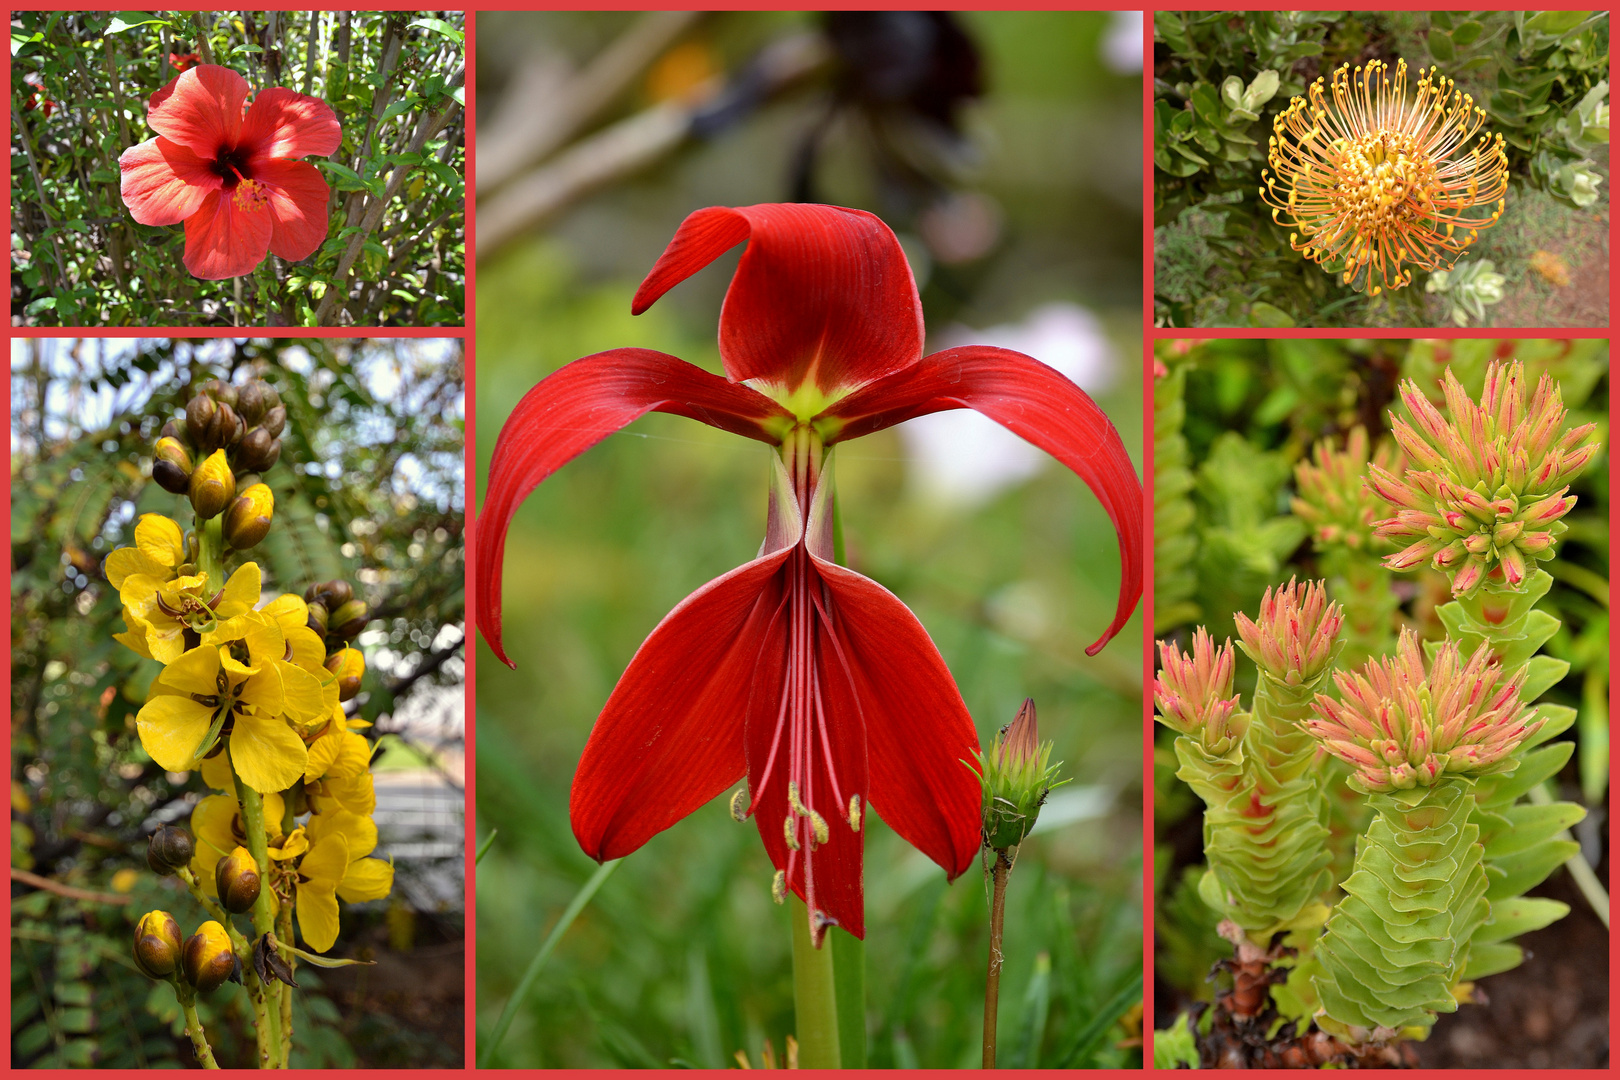 Madeira's Blütenpracht